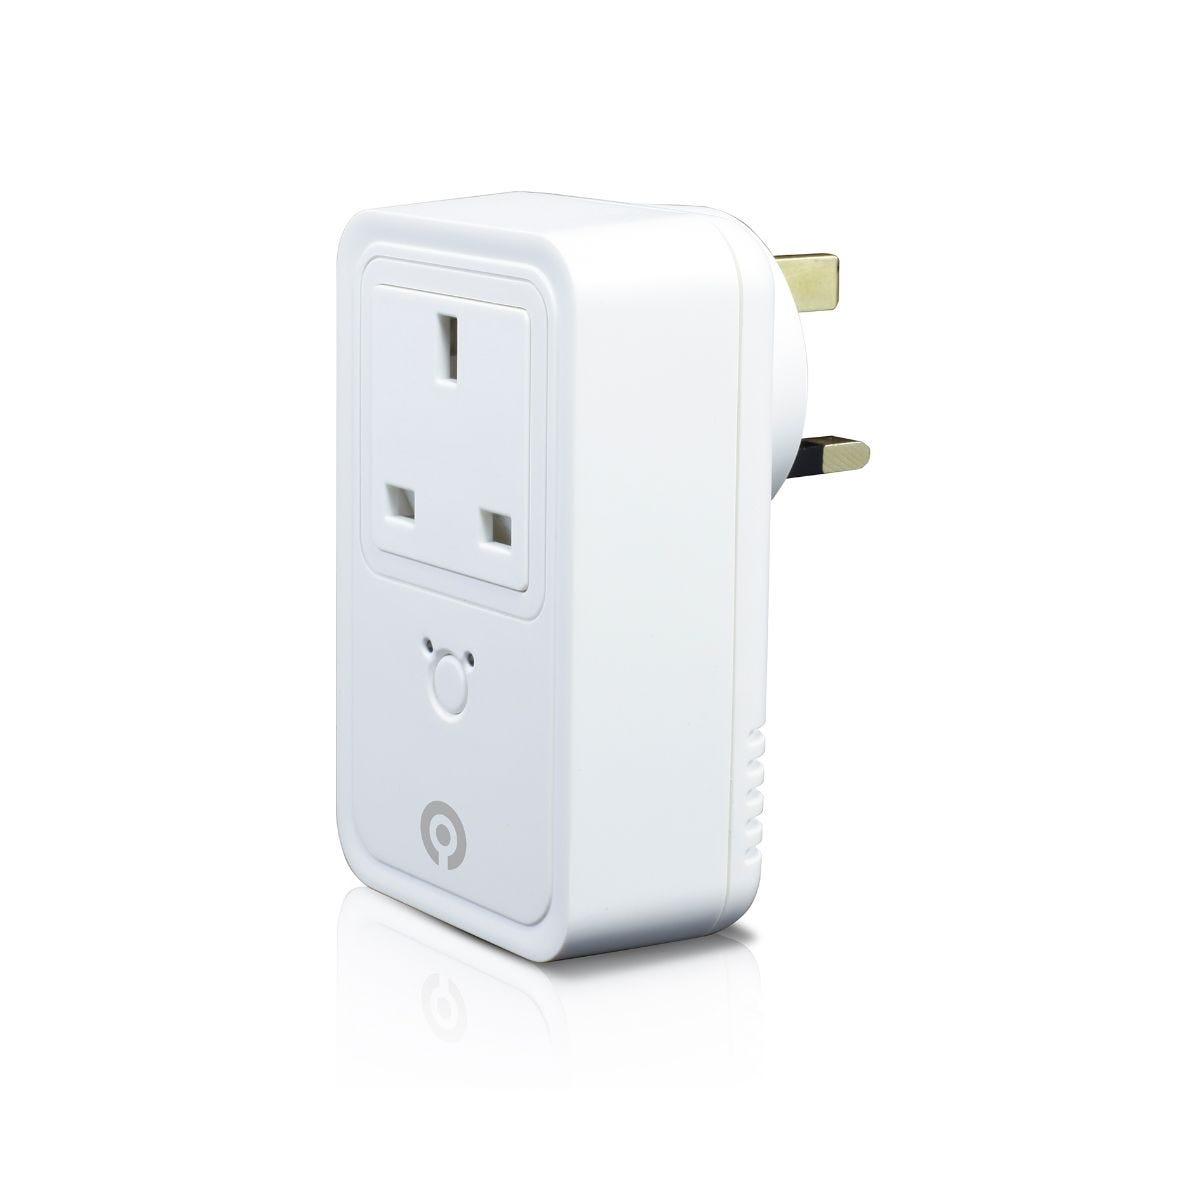 SwannOne Smart Plug